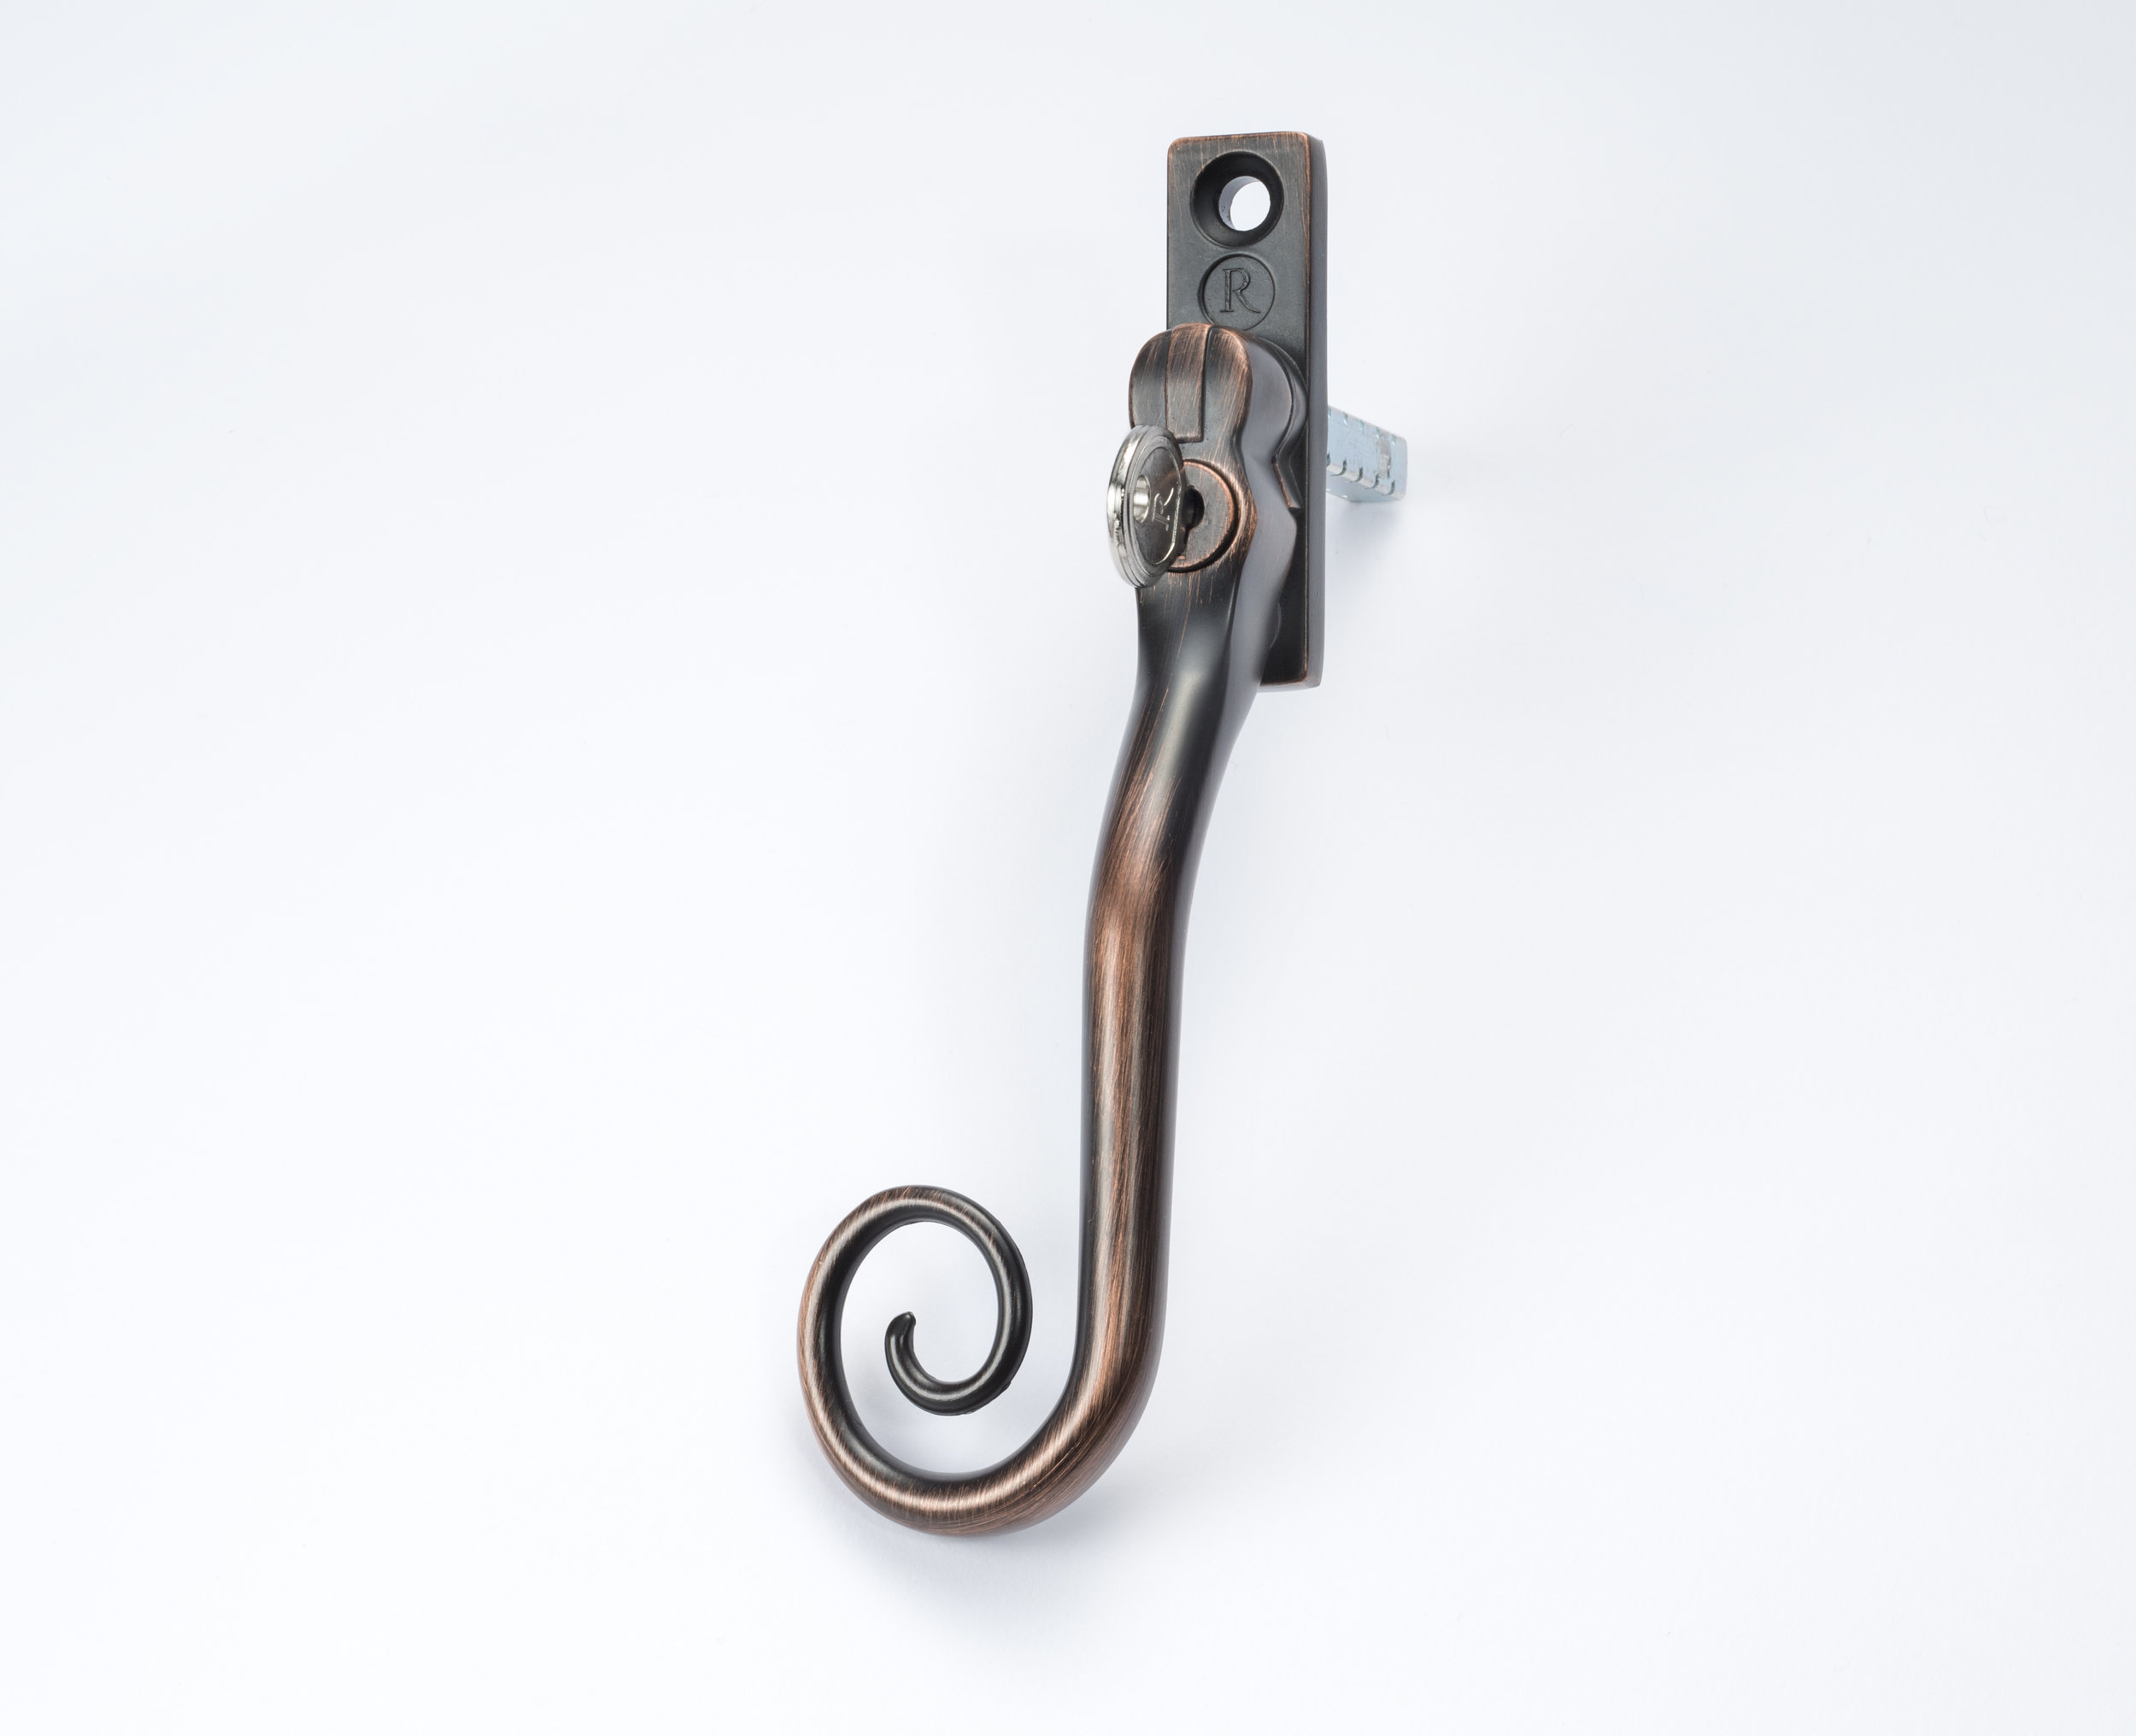 ESP15273_ESP55273_regal_hardware_monkey_tail_lh_bronze_red_tint - with key.jpg